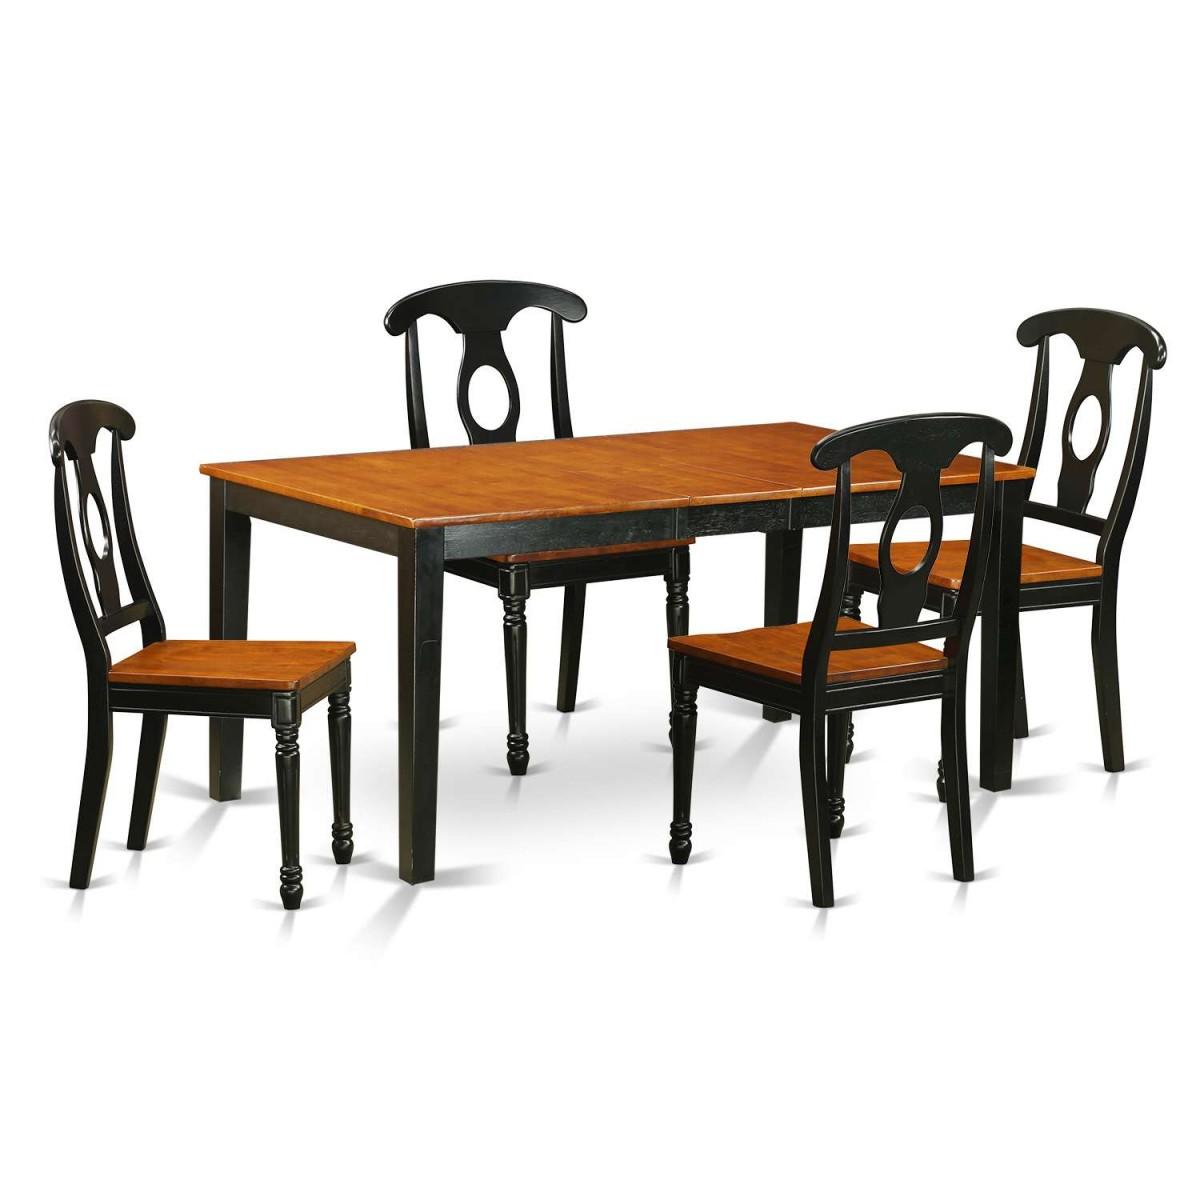 East West Nicoli 6 Piece Dining Set: East West Furniture Nicoli 5 Piece Table Set